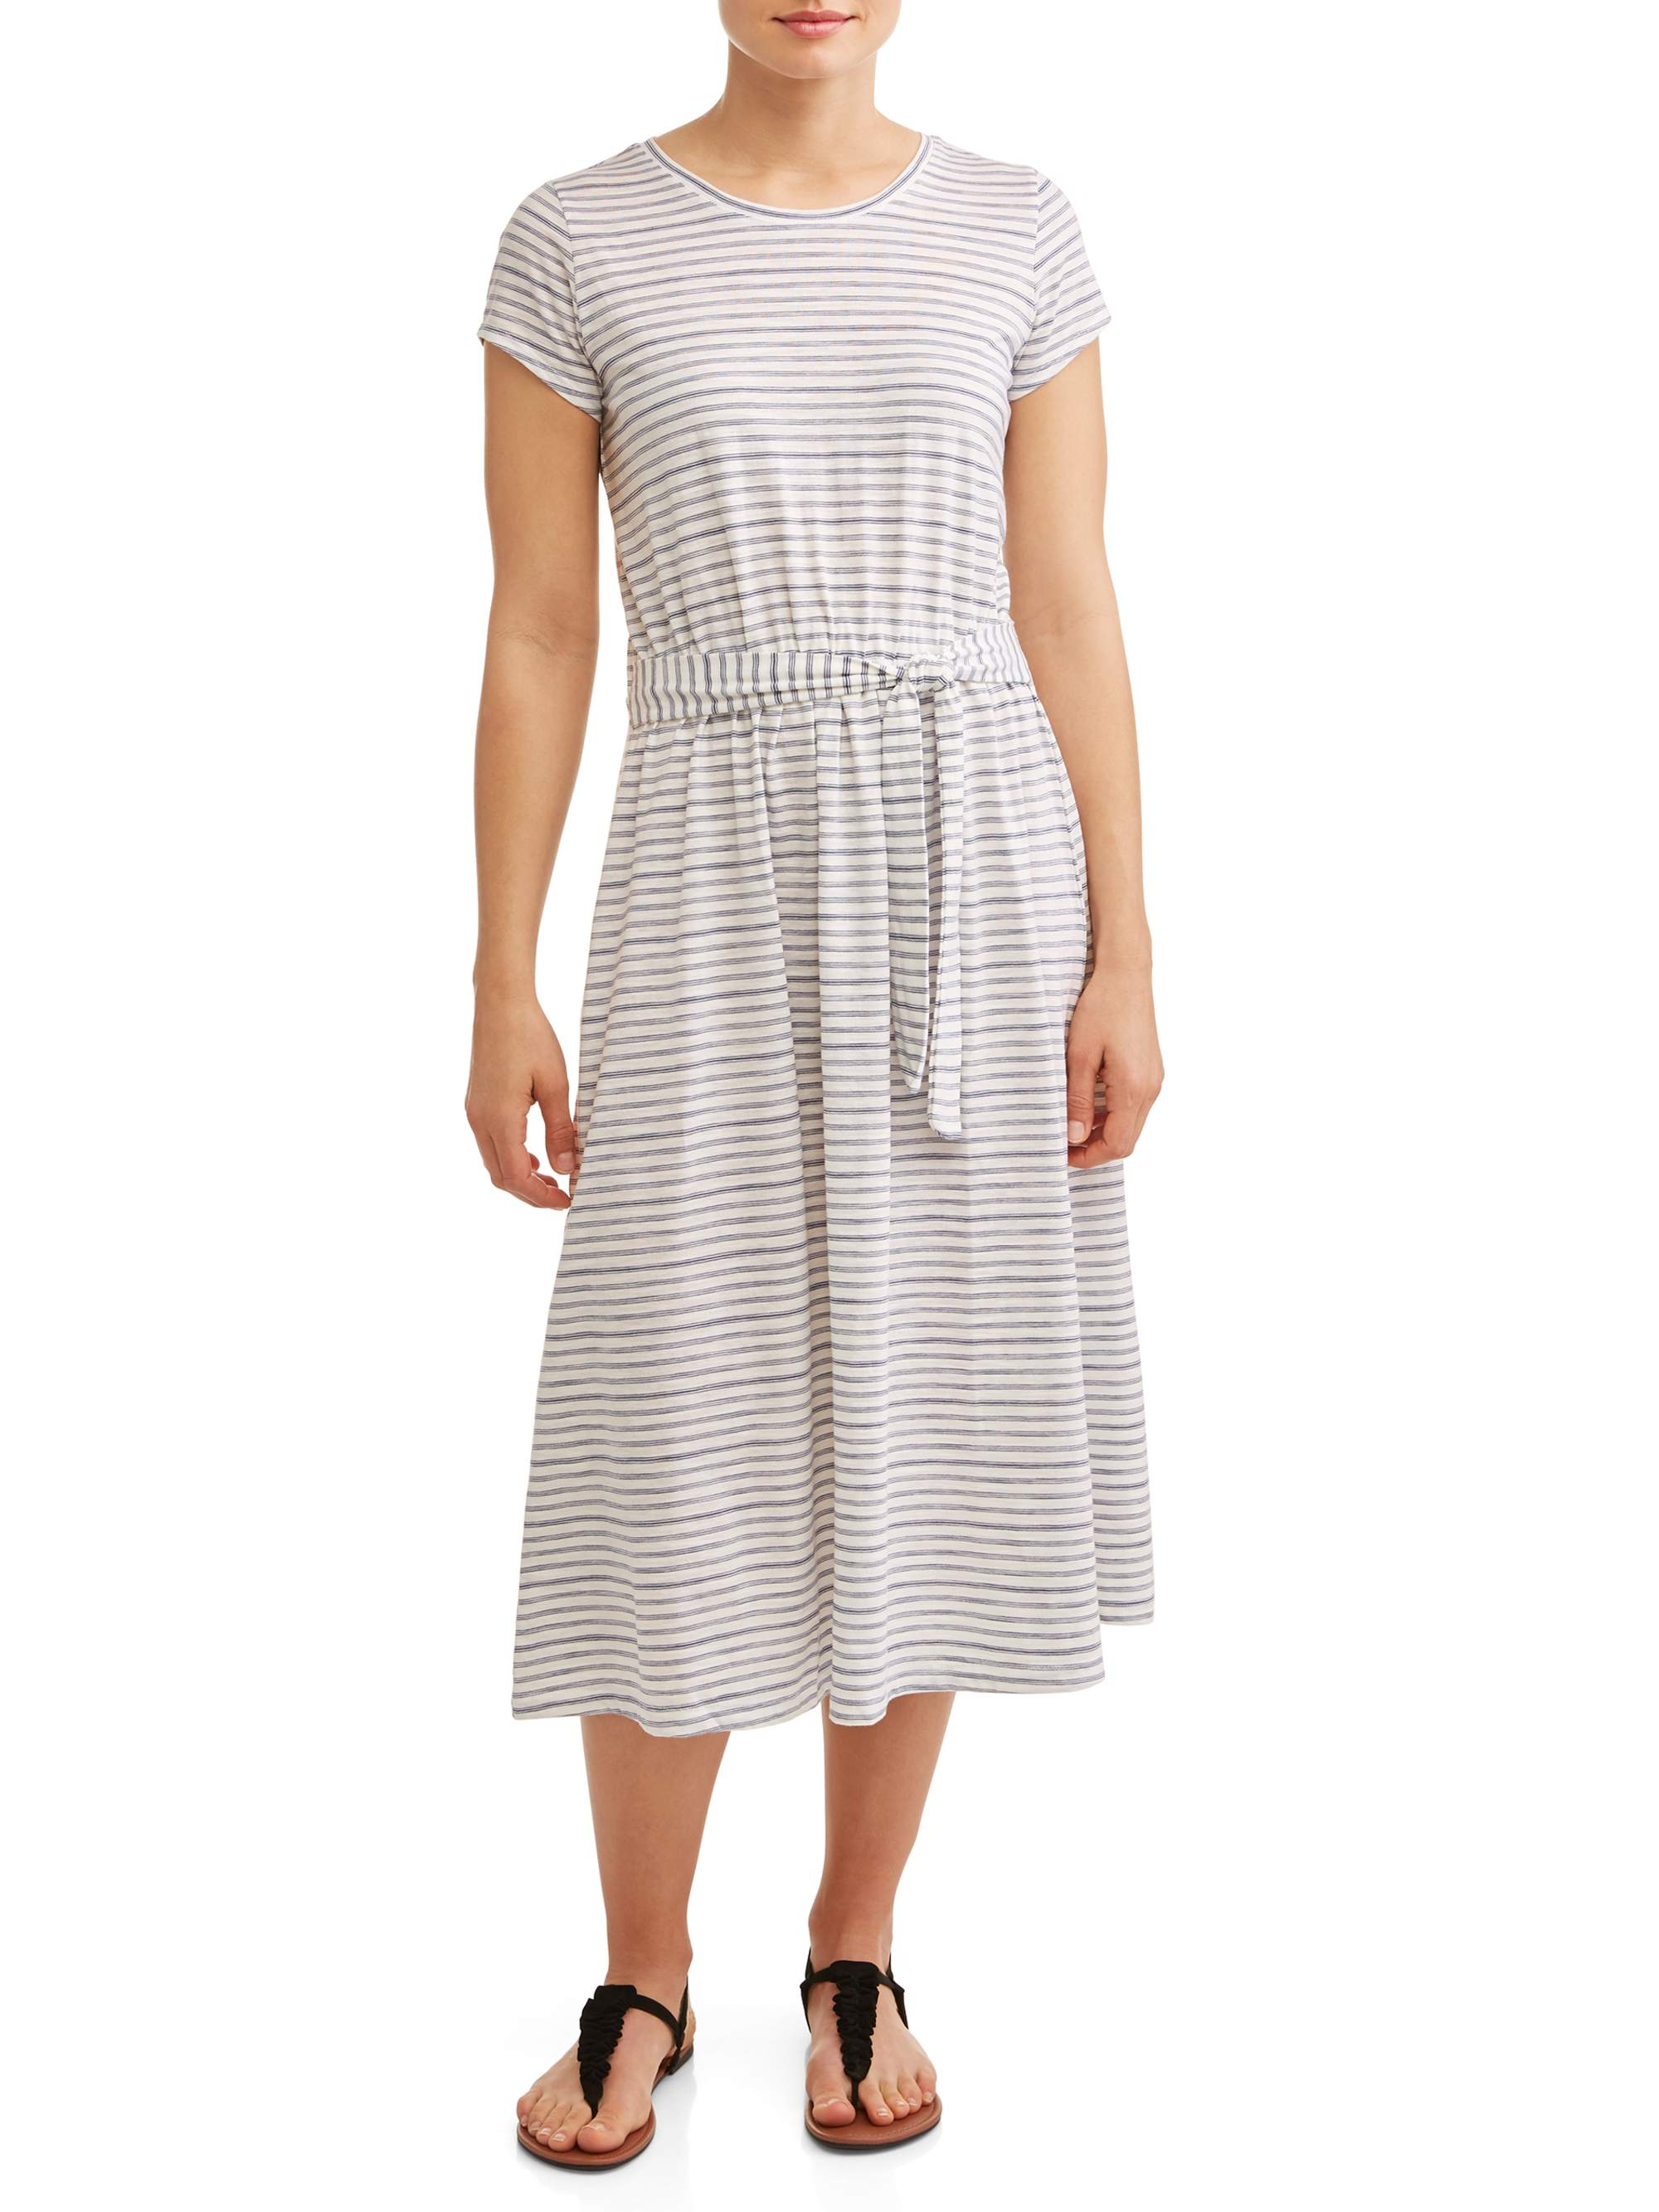 Women's Knit Tie Waist Dress